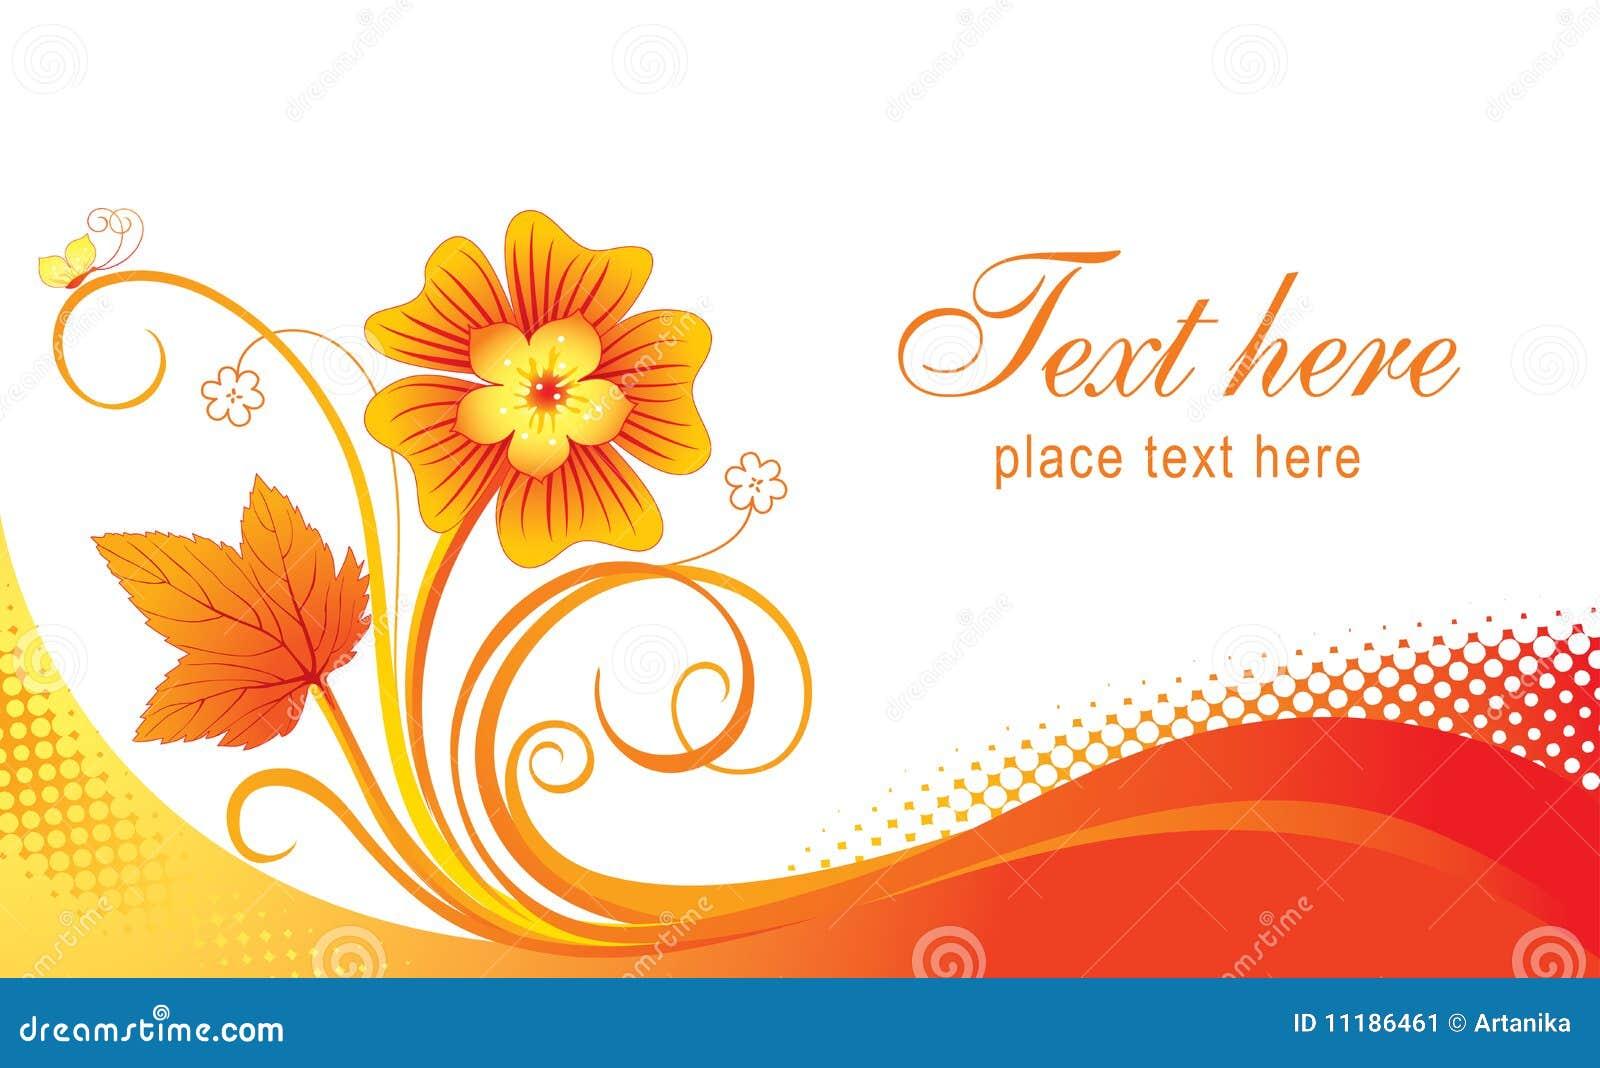 Business card stock vector. Image of leaf, pattern, frame - 11186461